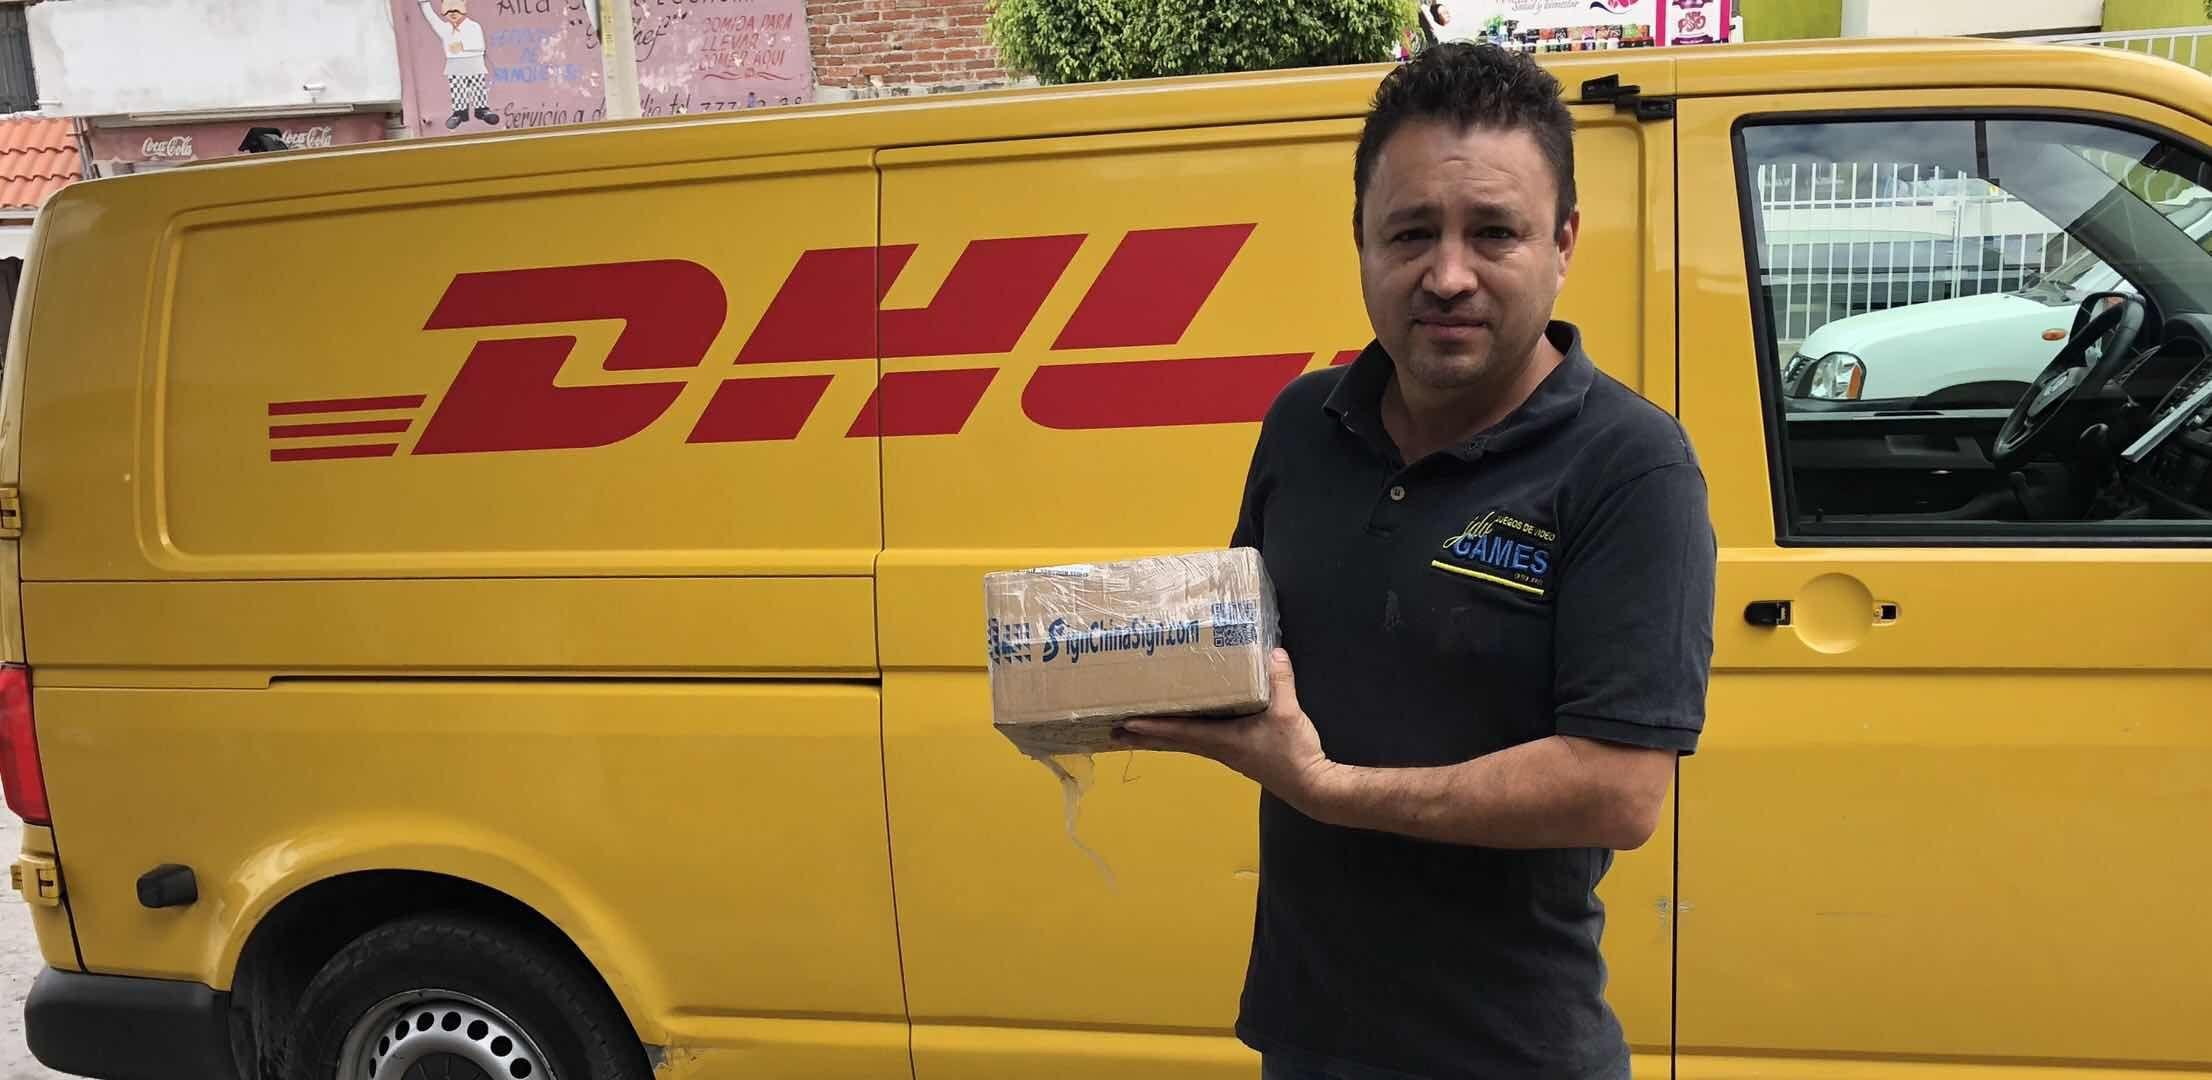 Mexico-Sr.Jorge David Vazquez comprio repuestos de plotters